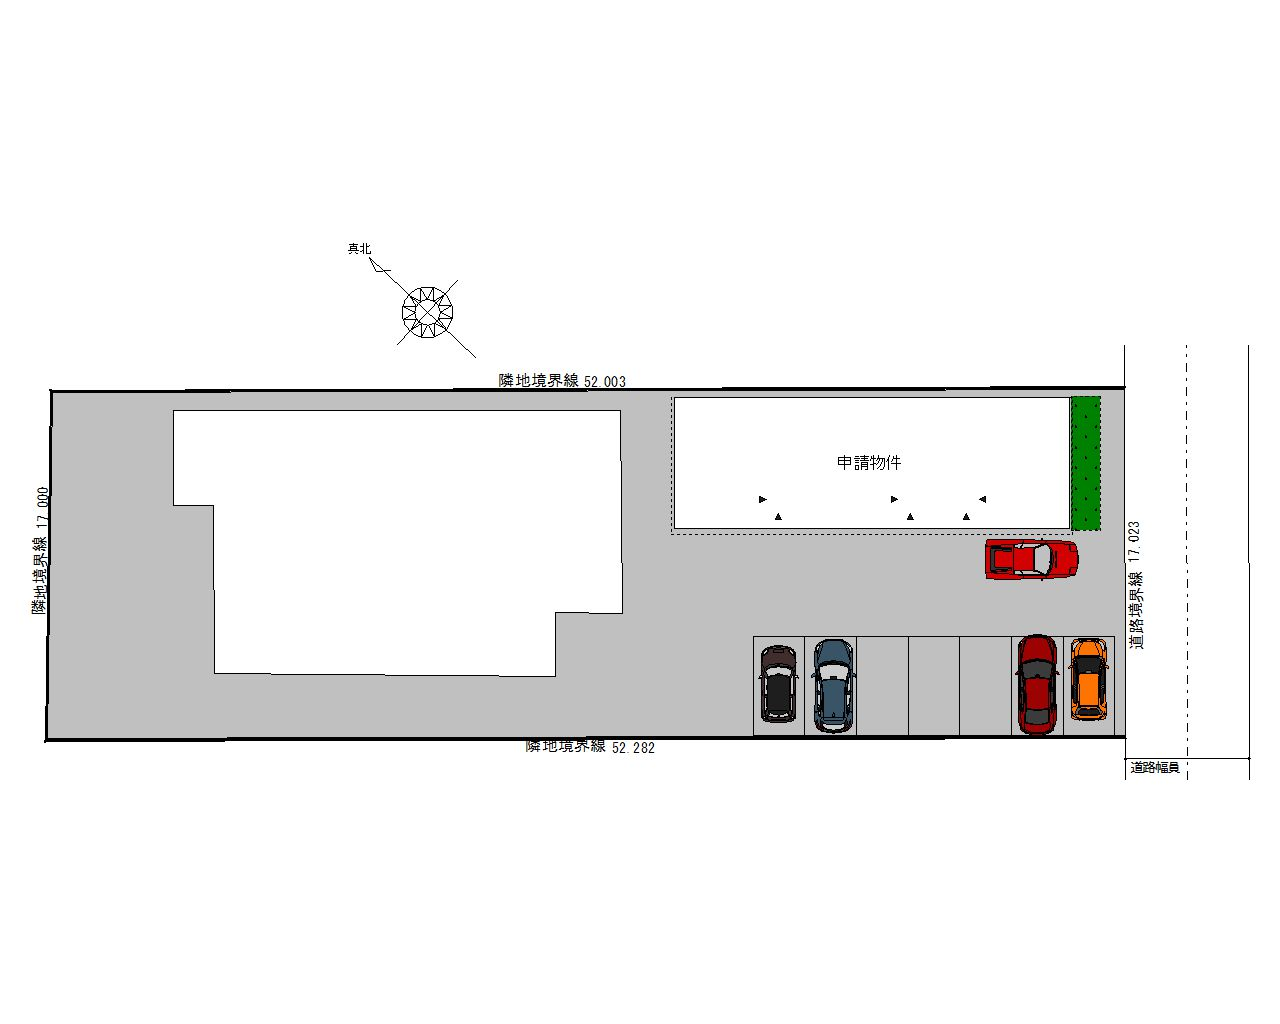 ESPRSSOガレージハウス西尾一色町 配置図